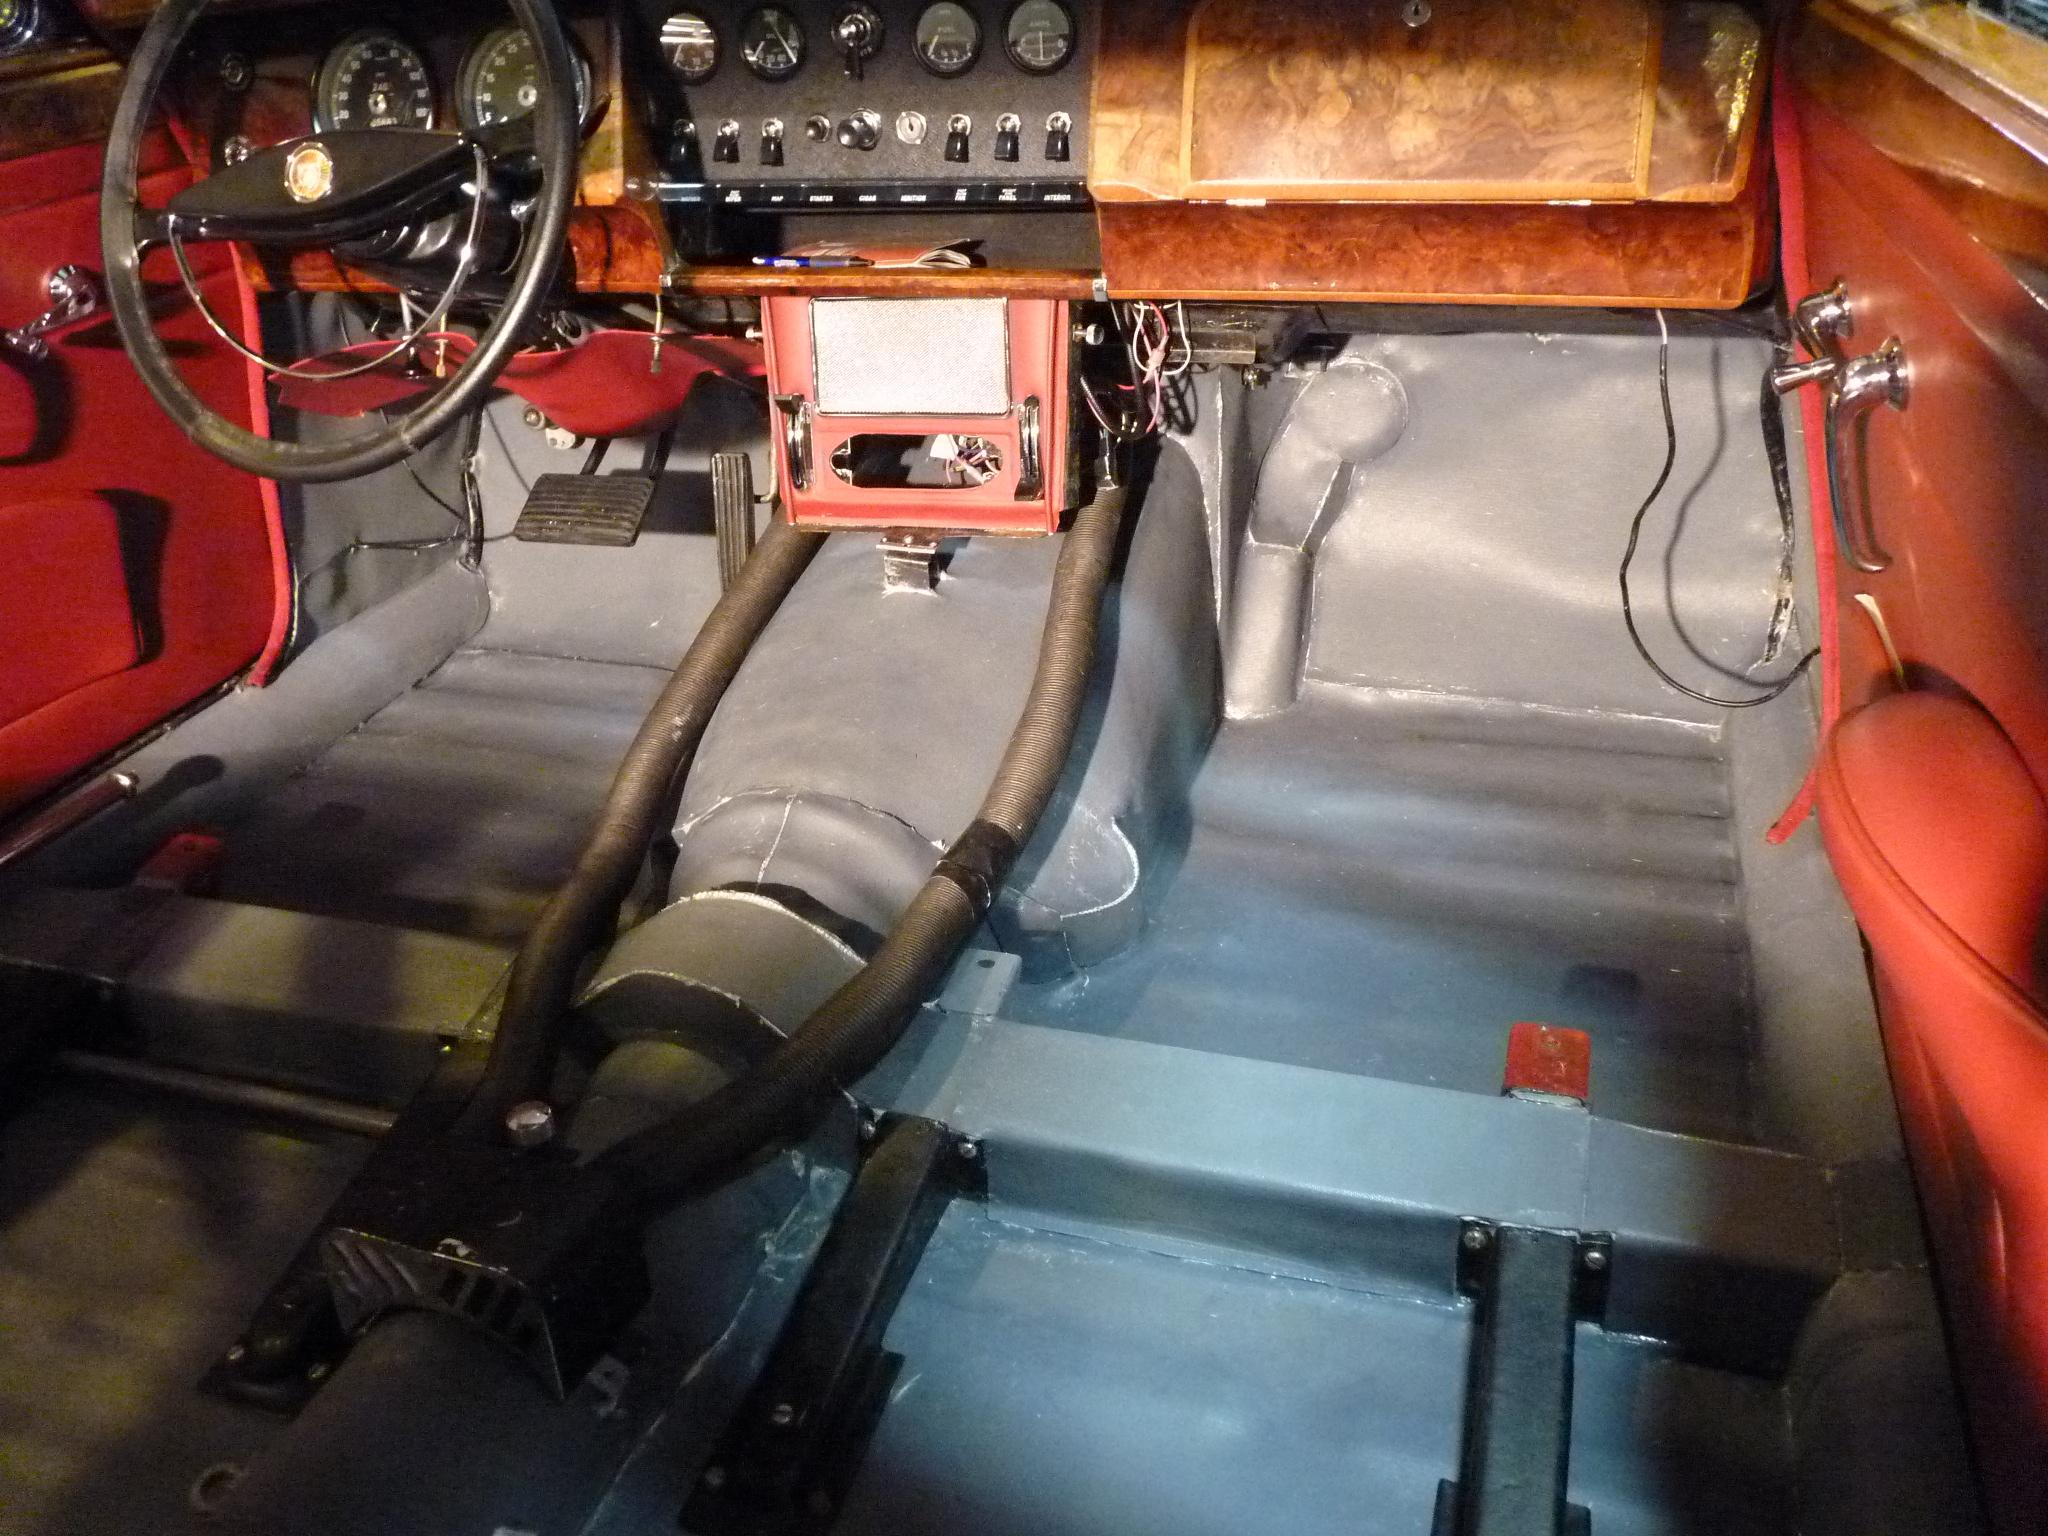 Auto Restoration Heat Protection Kits Koolmat 66 Mustang Fuse Box Contacts 97218 71 74 Jaguar V 12